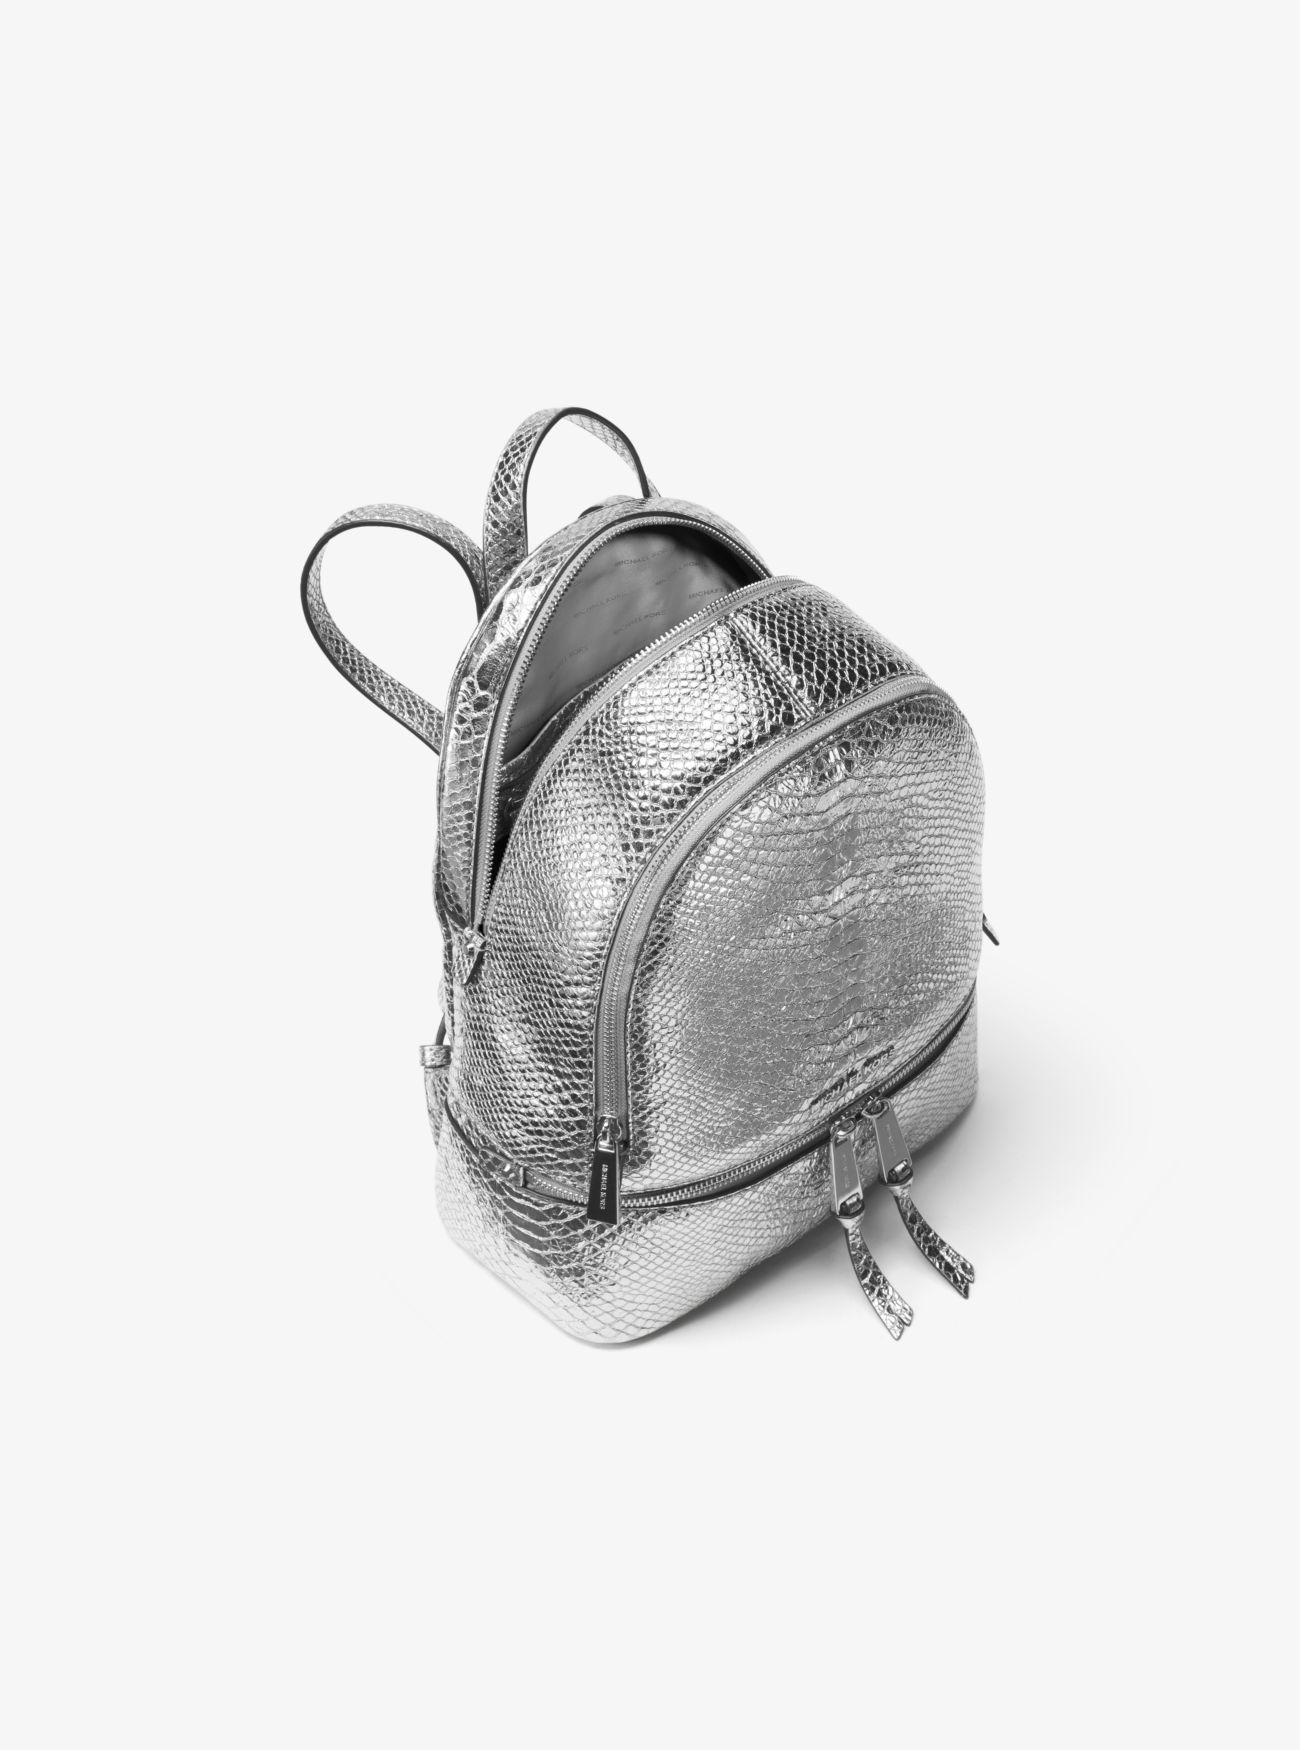 e6e713974637 Michael Kors Rhea Medium Metallic Embossed-leather Backpack in ...